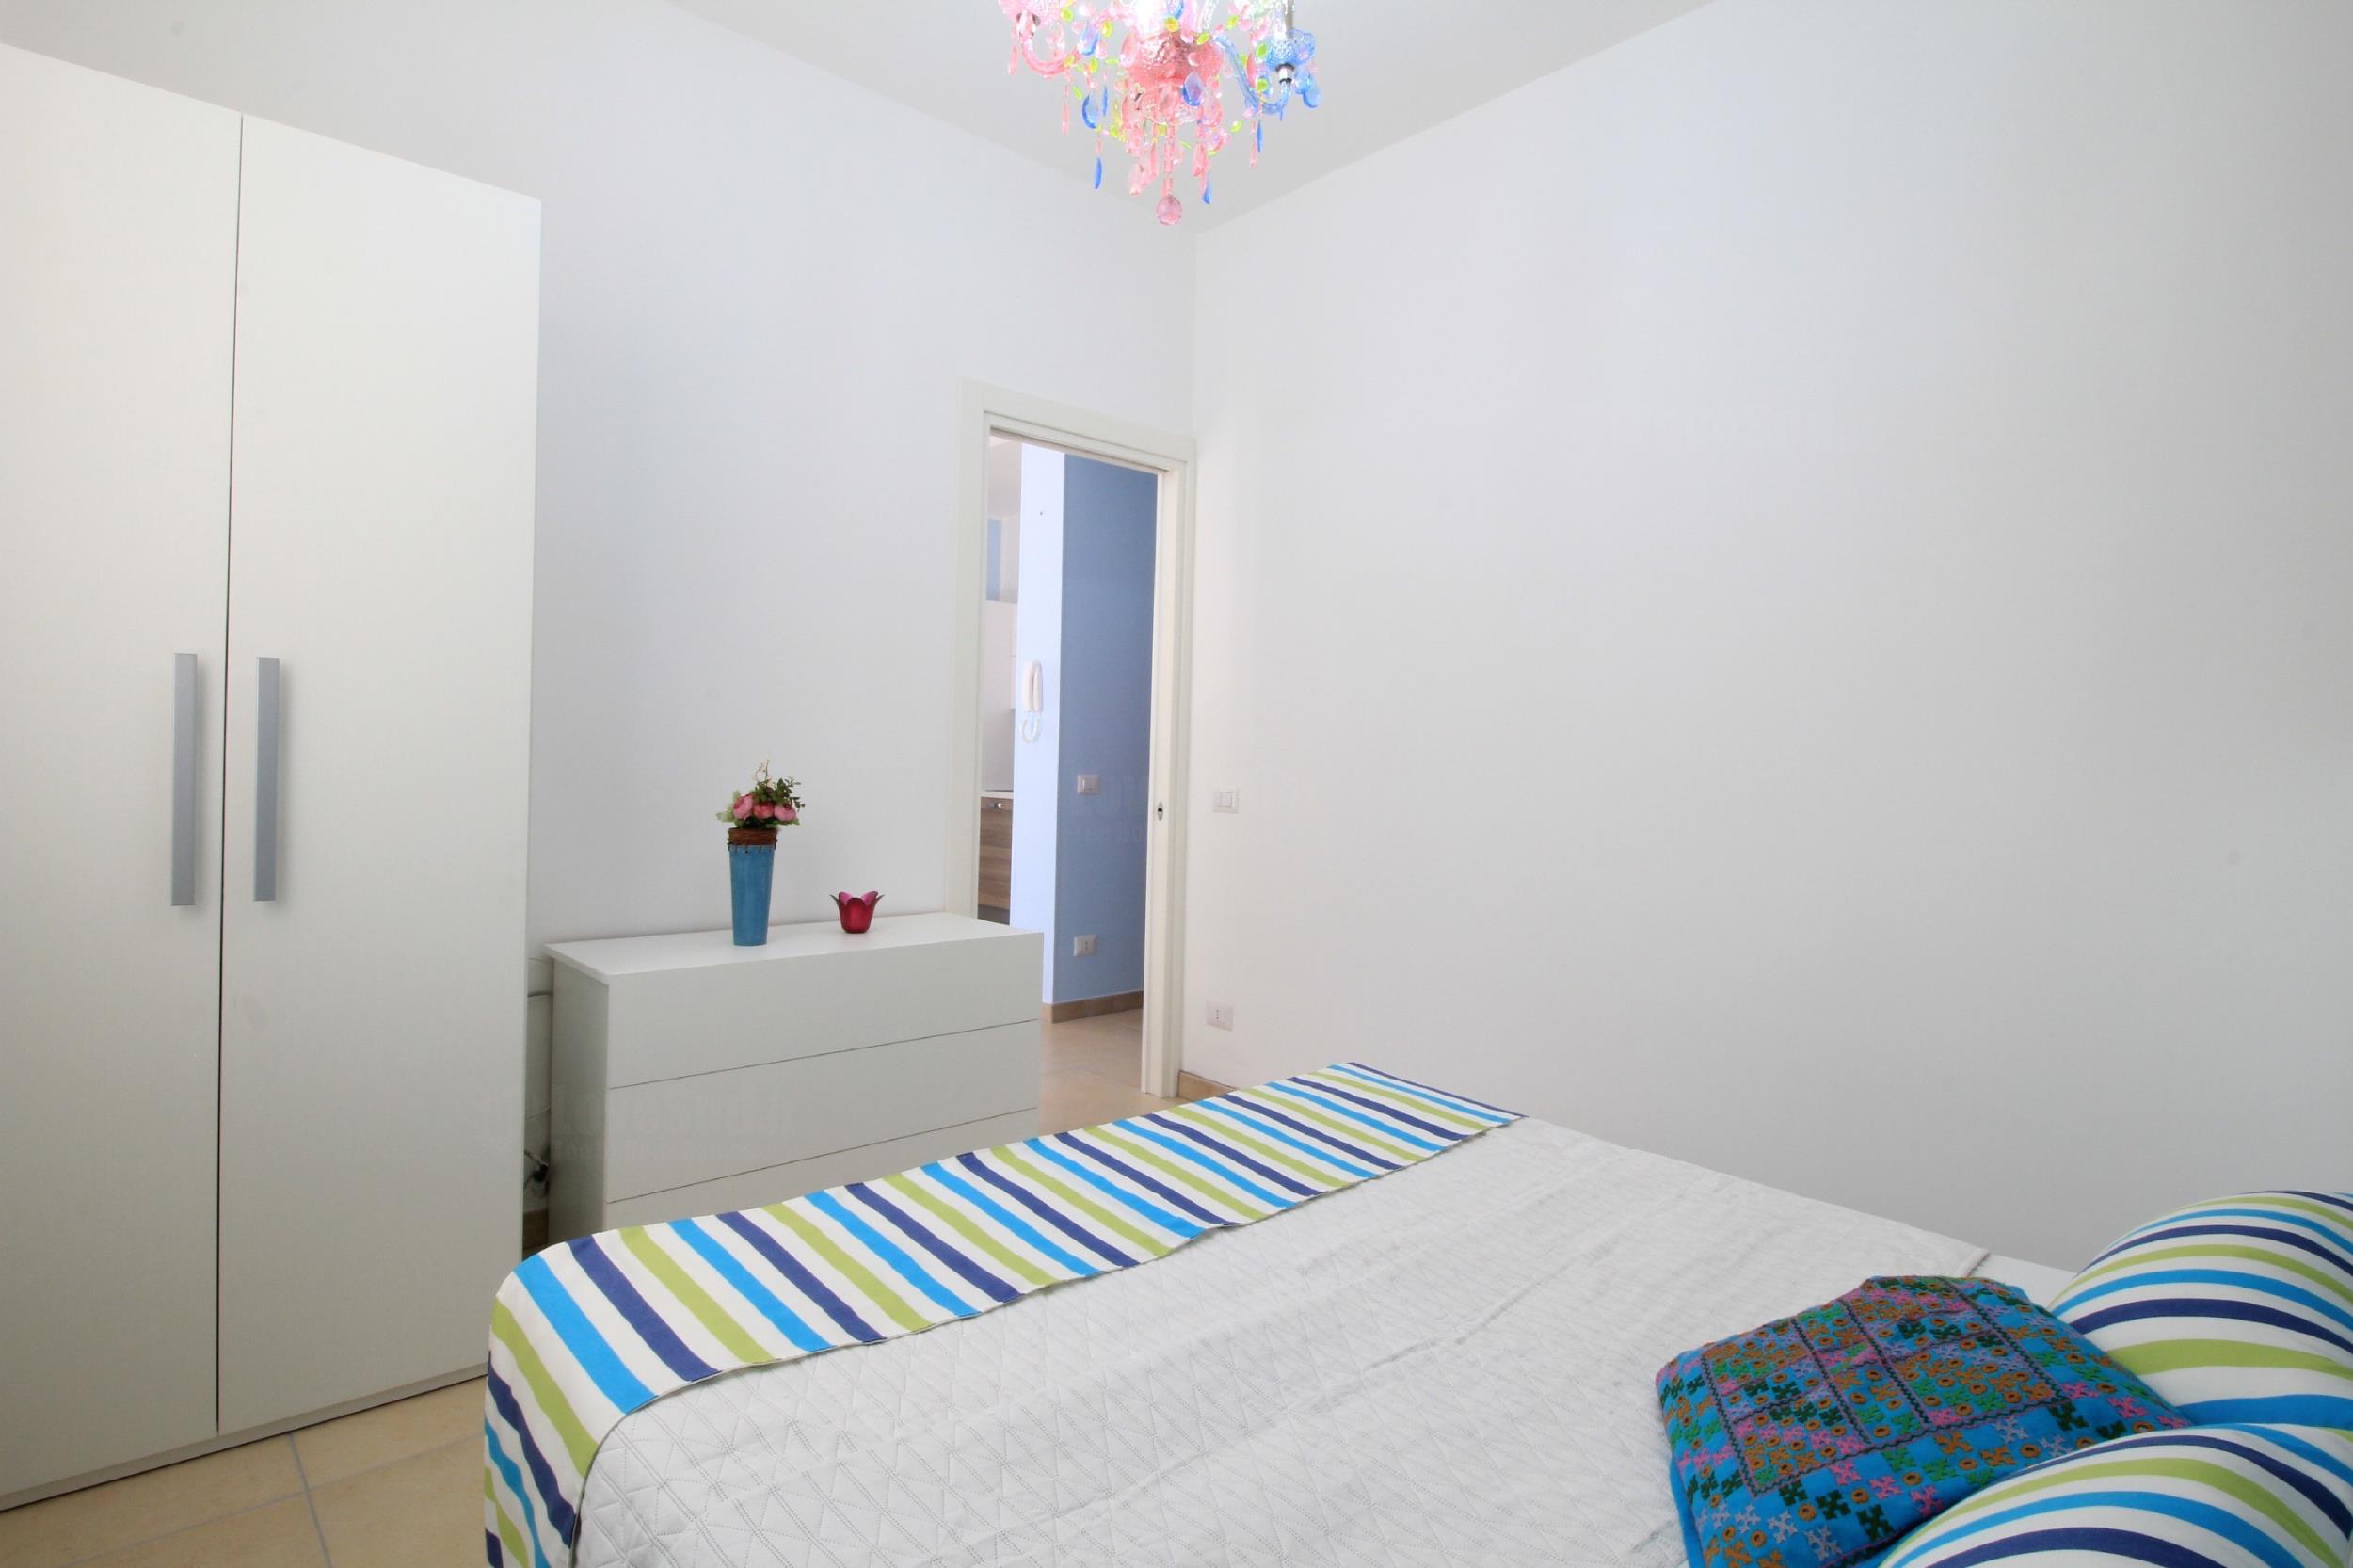 Apartment Elcisia luxe beach house photo 23457102